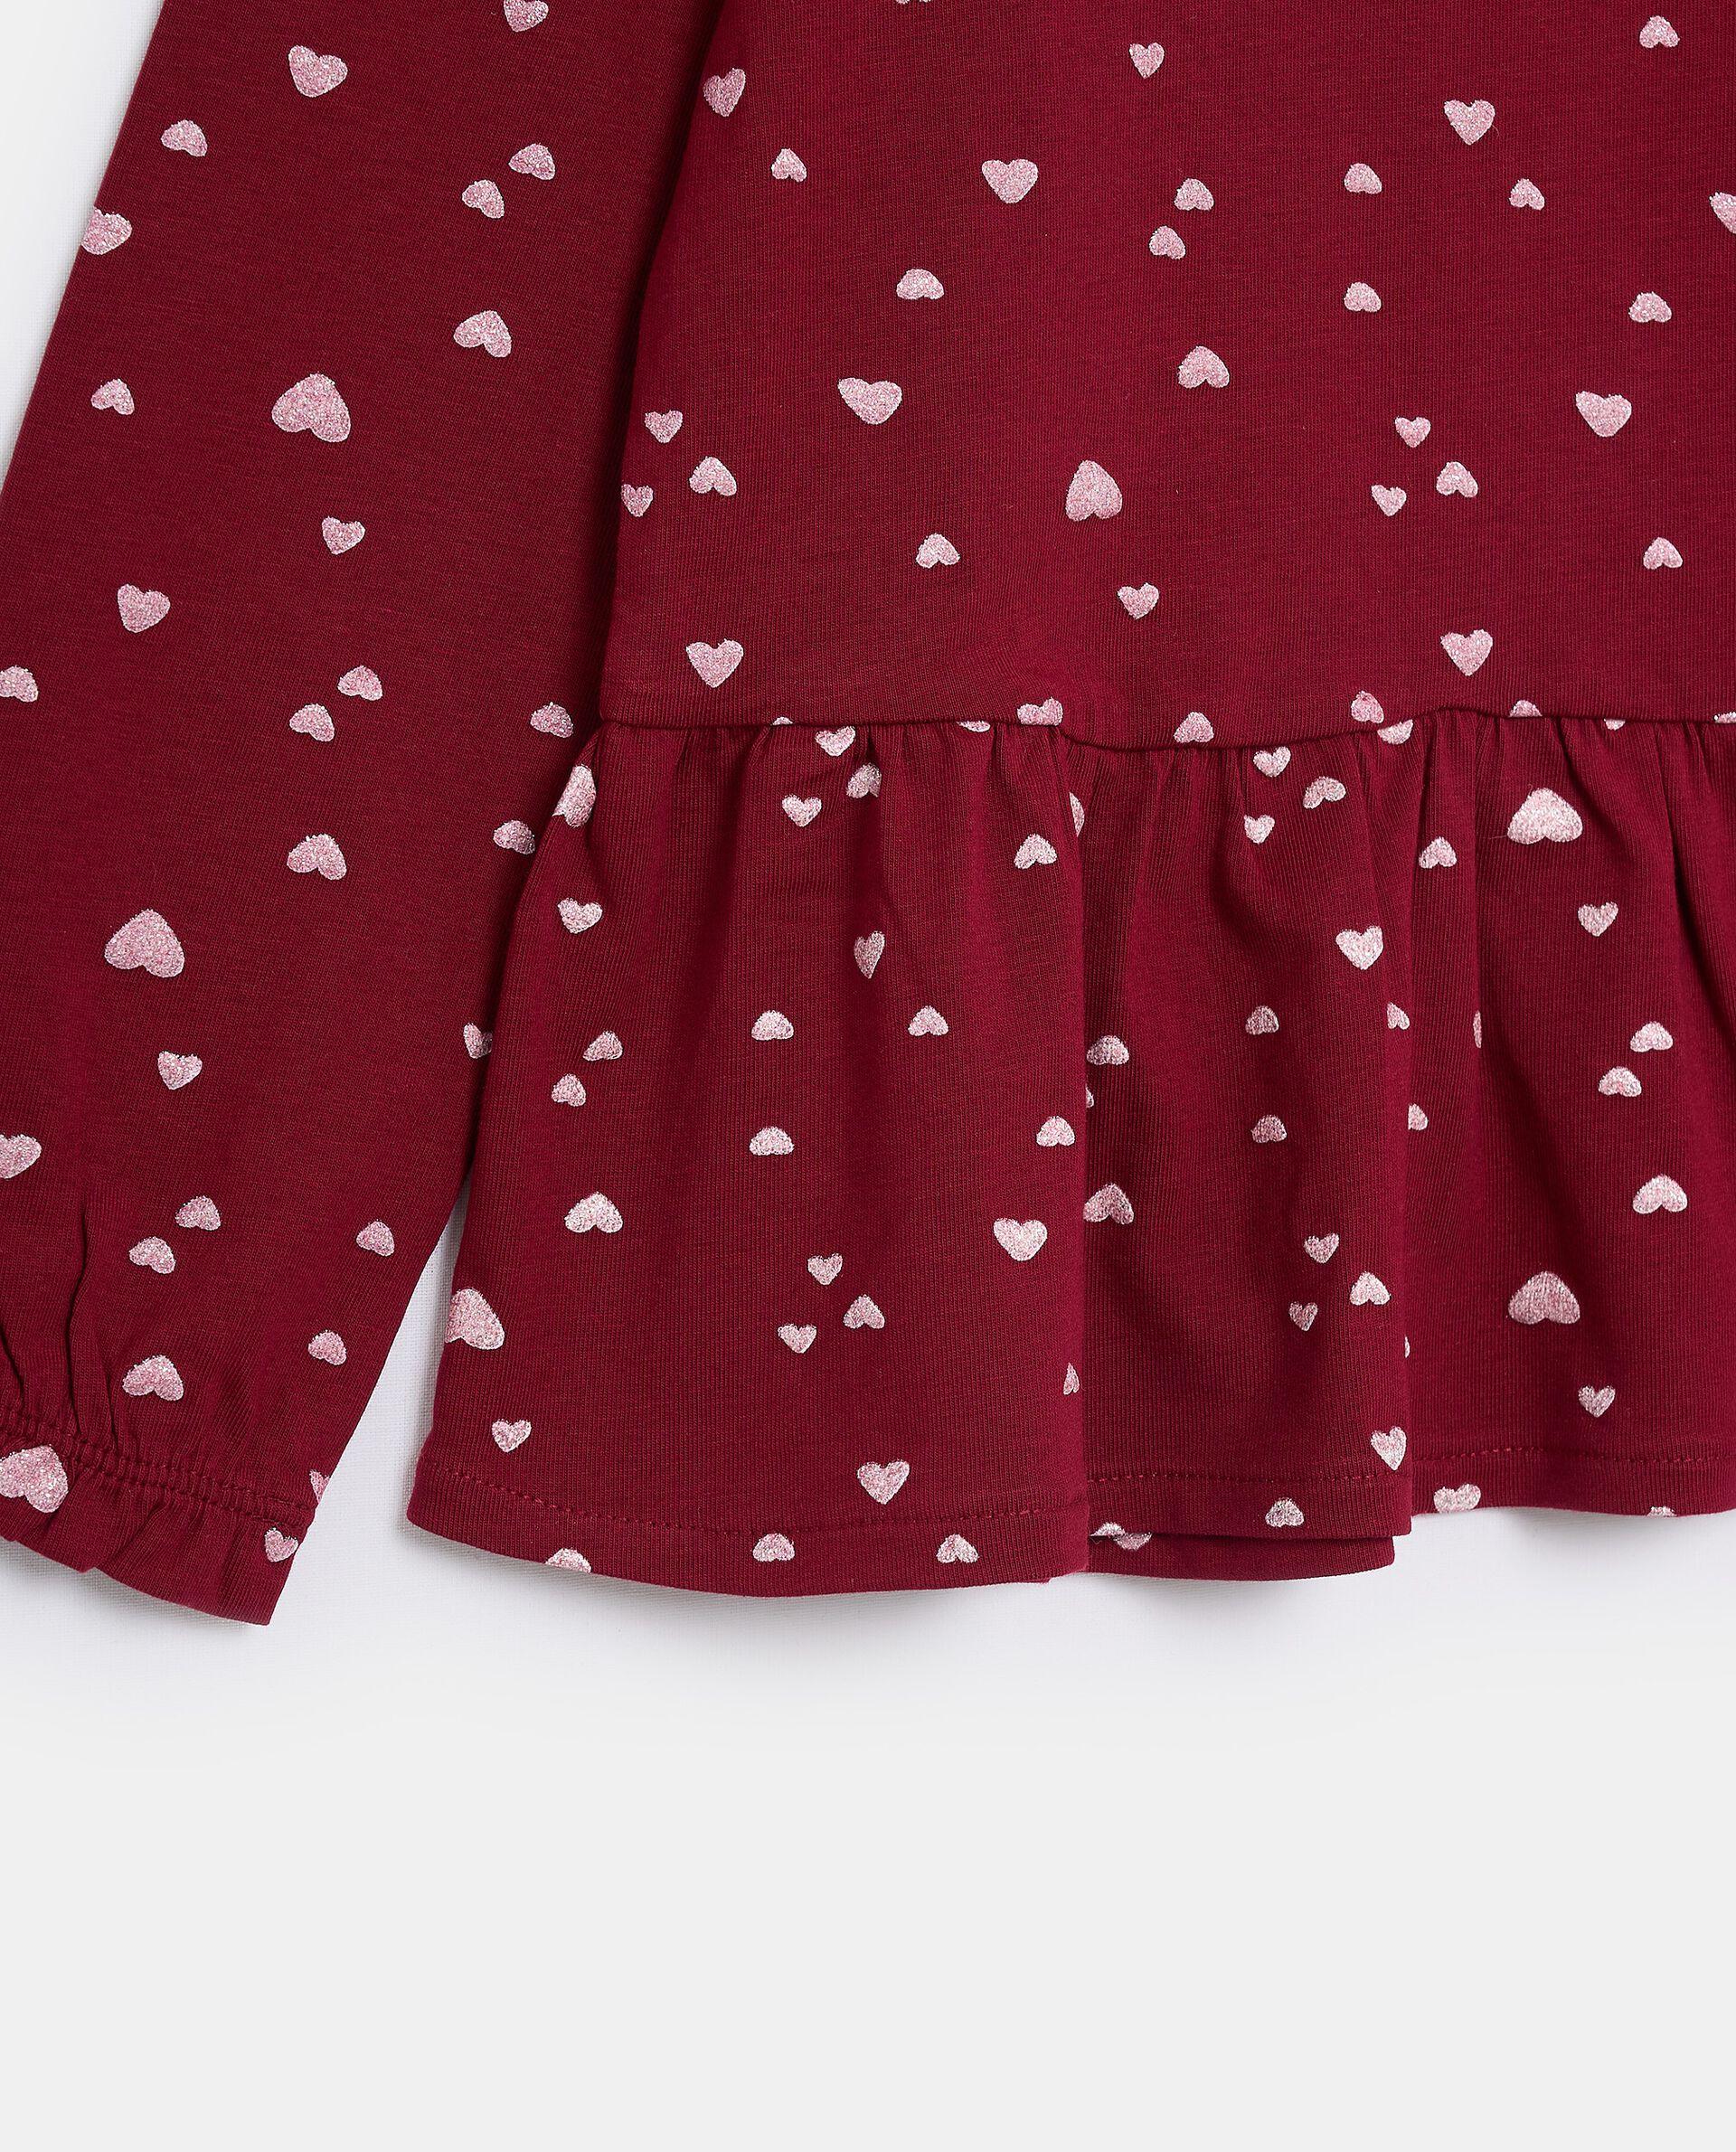 T-shirt in jersey stretch di cotone organico bambina